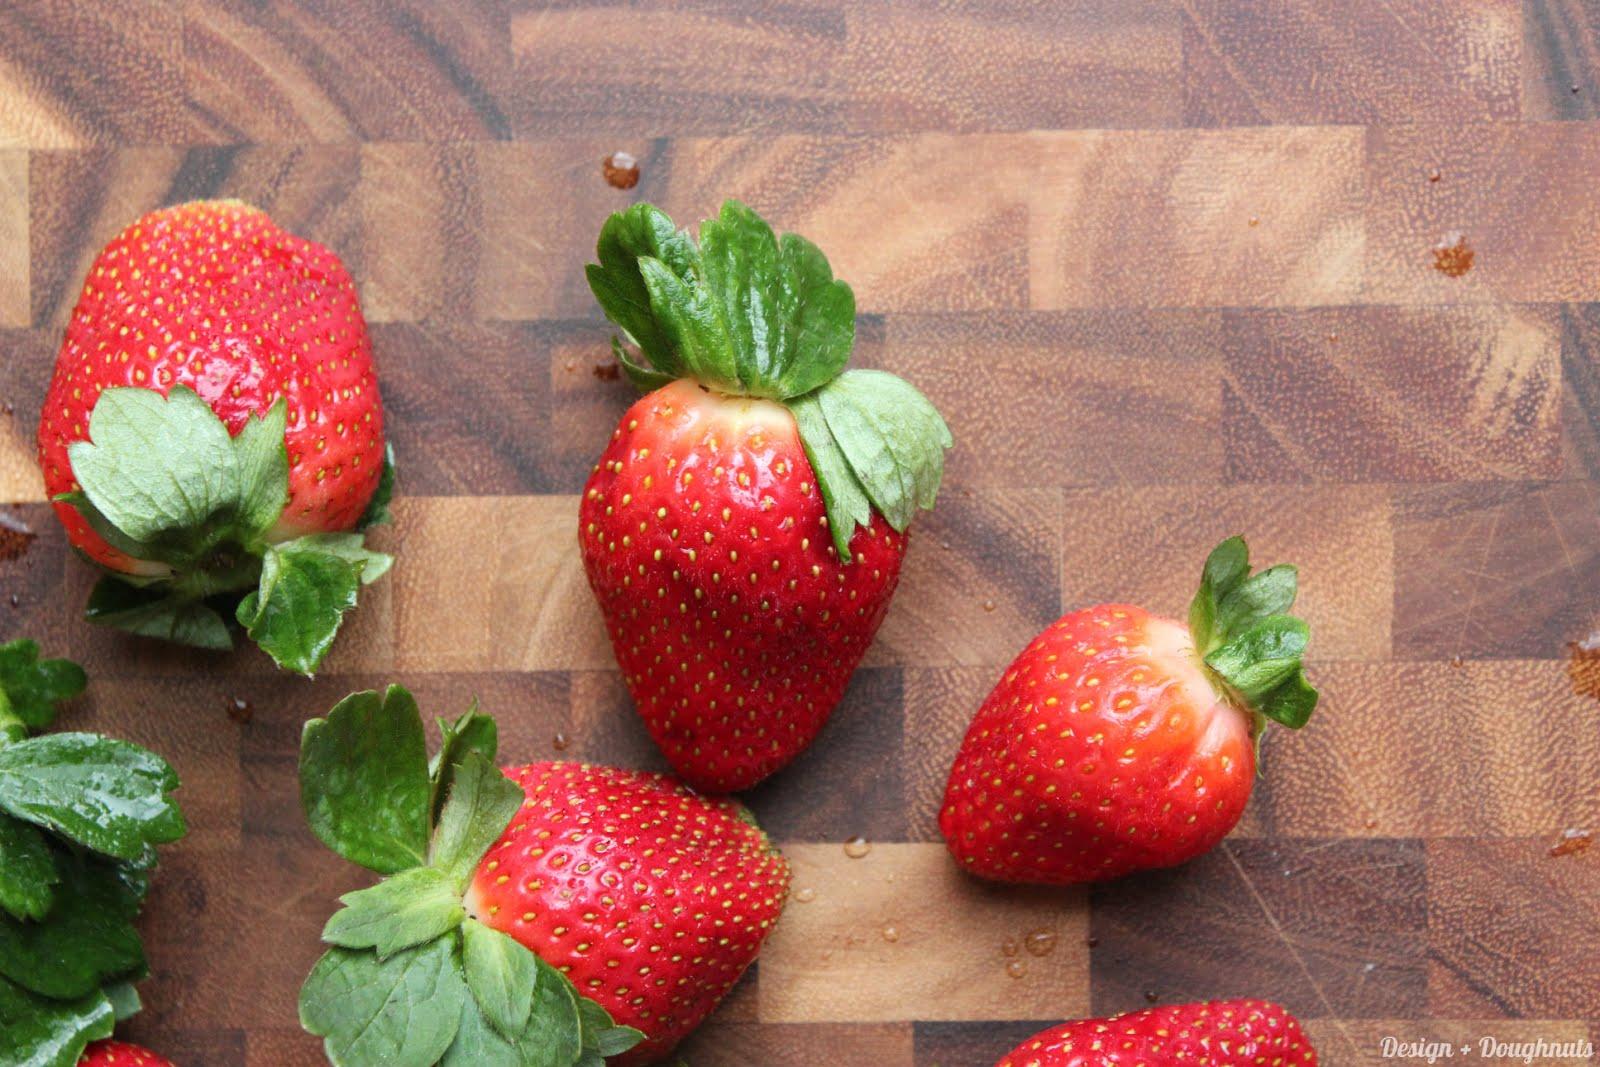 ... : Strawberries, Sugar, Lemon, Liquid Certo, Vanilla Bean Paste